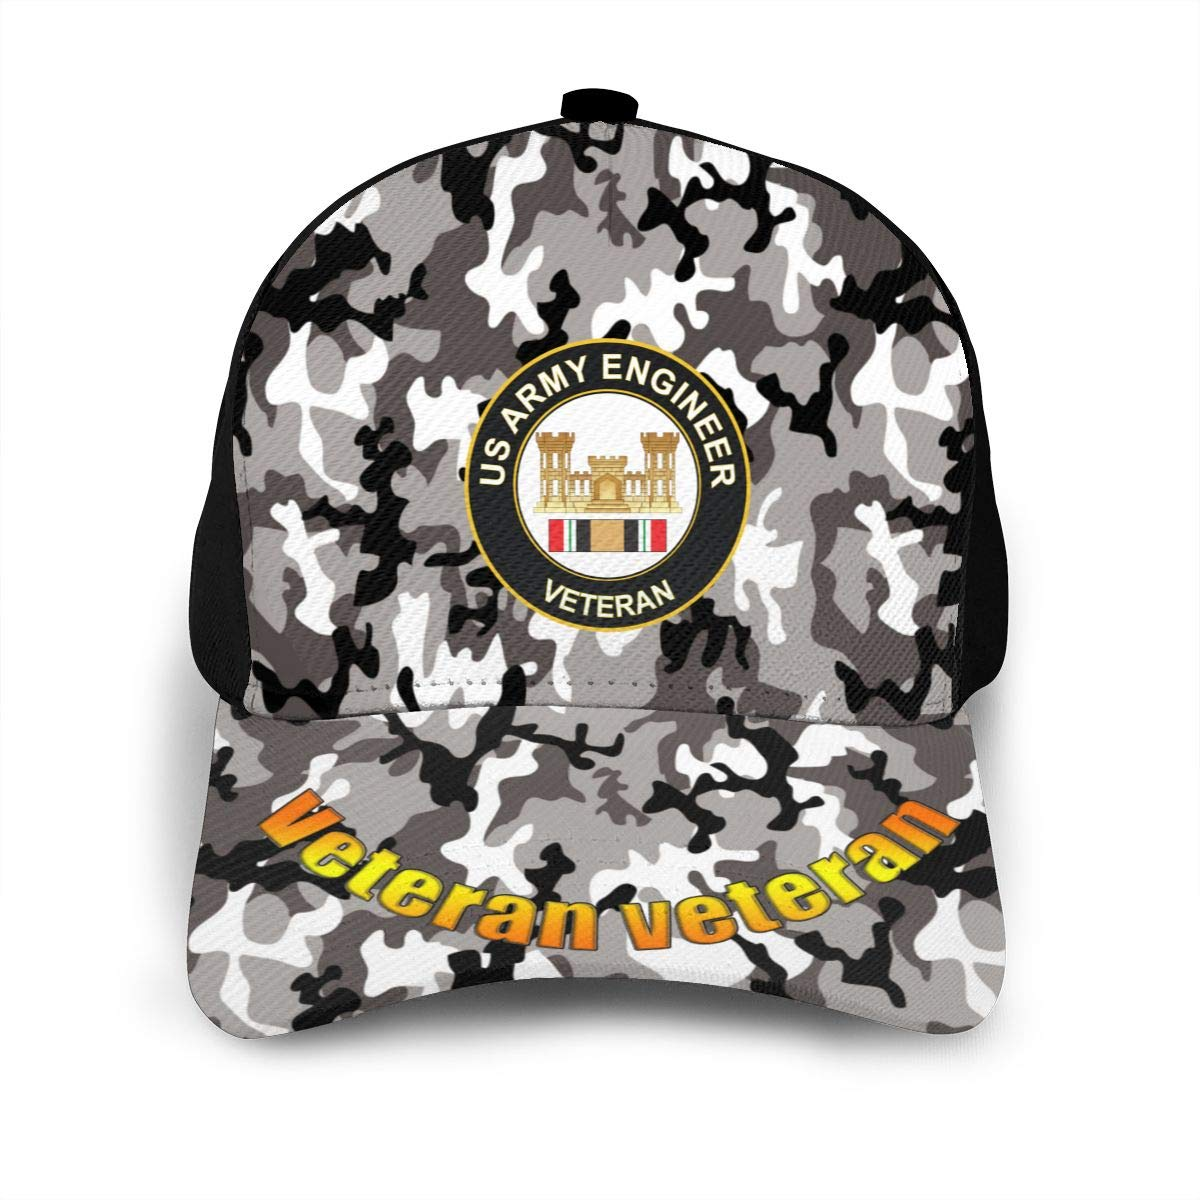 Army Engineer Iraq Veteran Classic Adult Caps Printing Bend Along Baseball Hats Snapback Men Women Hats Adjustable